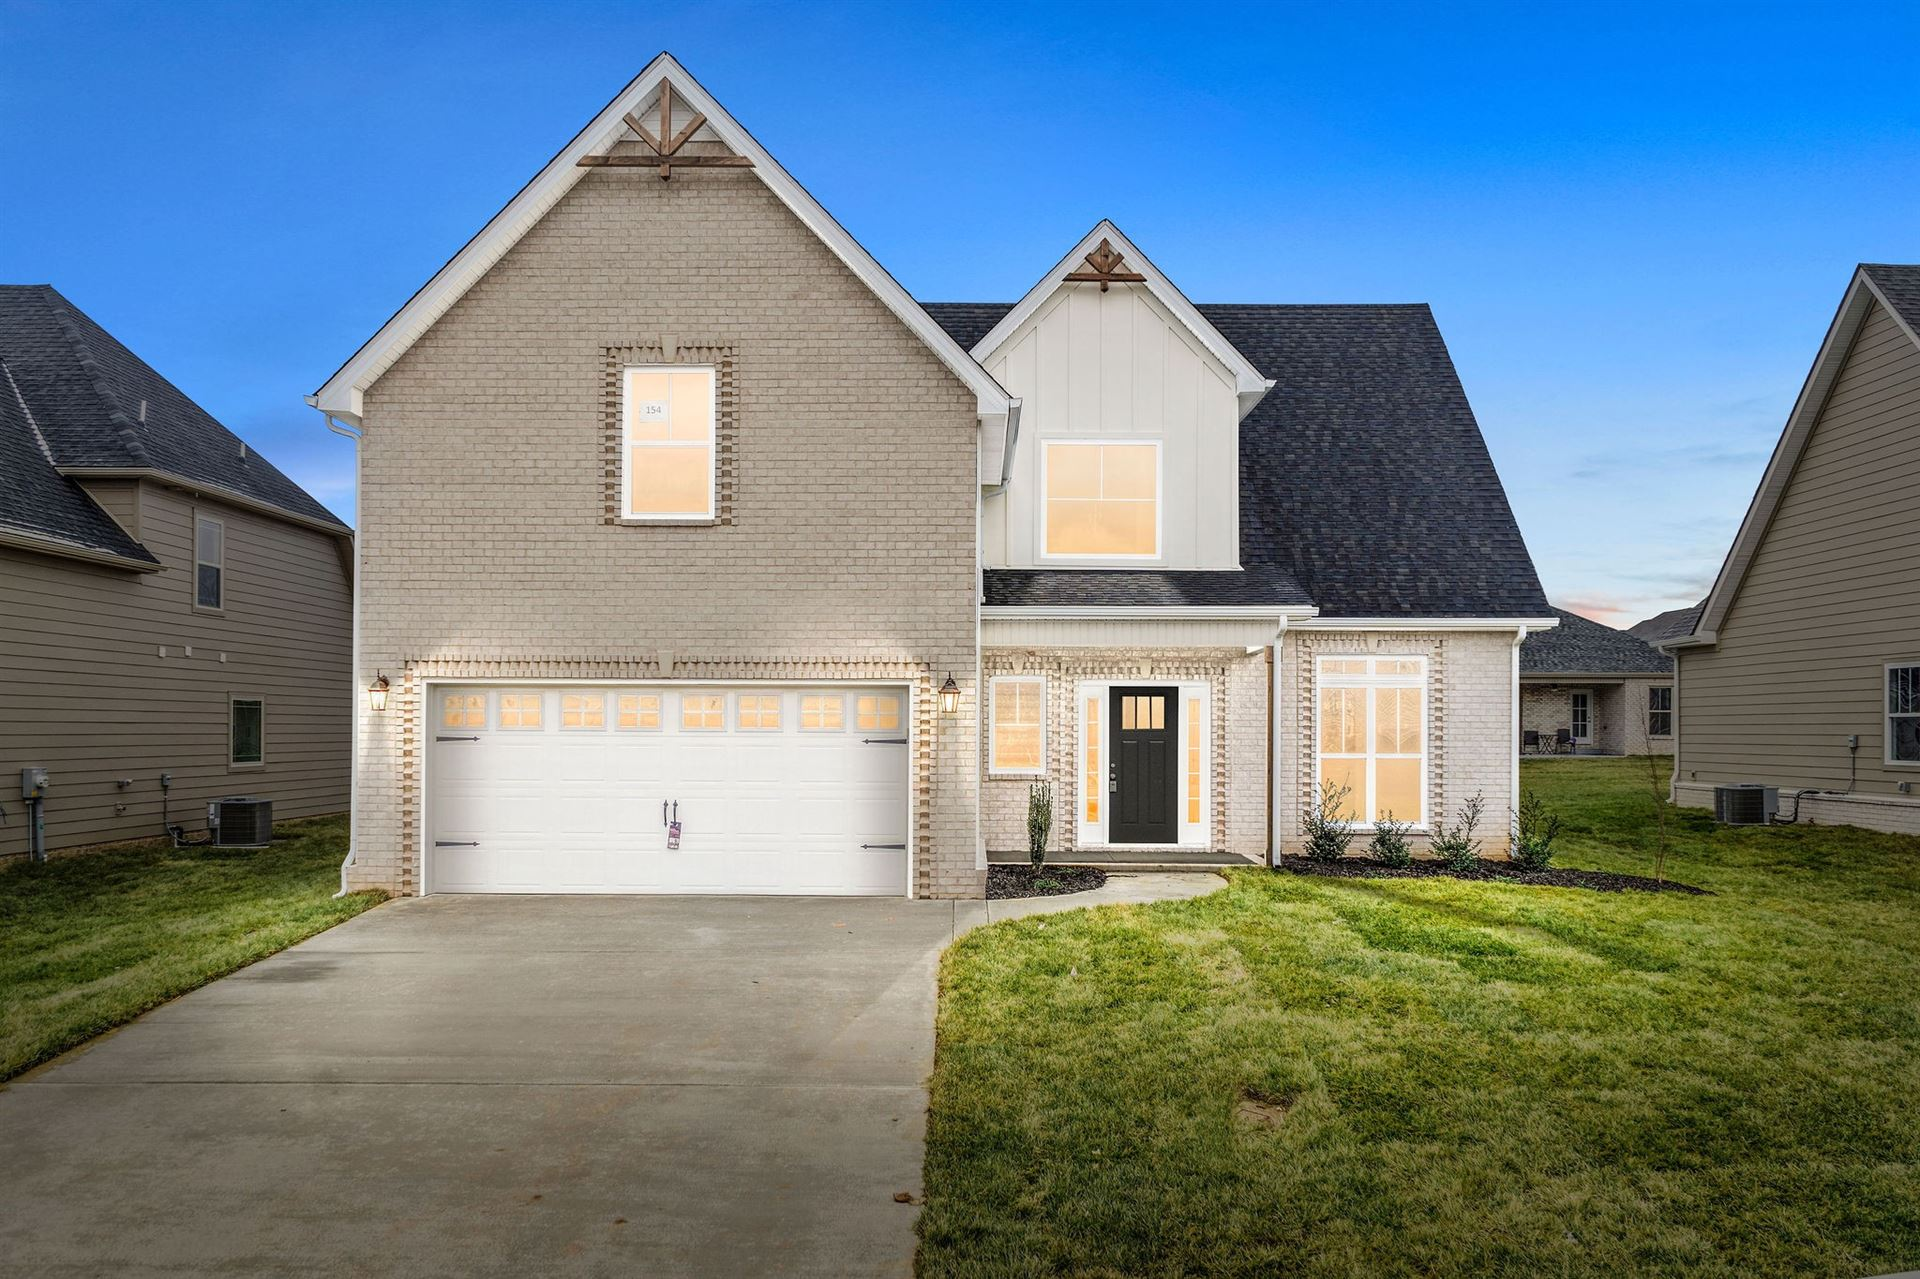 154 Hereford Farm, Clarksville, TN 37043 - MLS#: 2221325